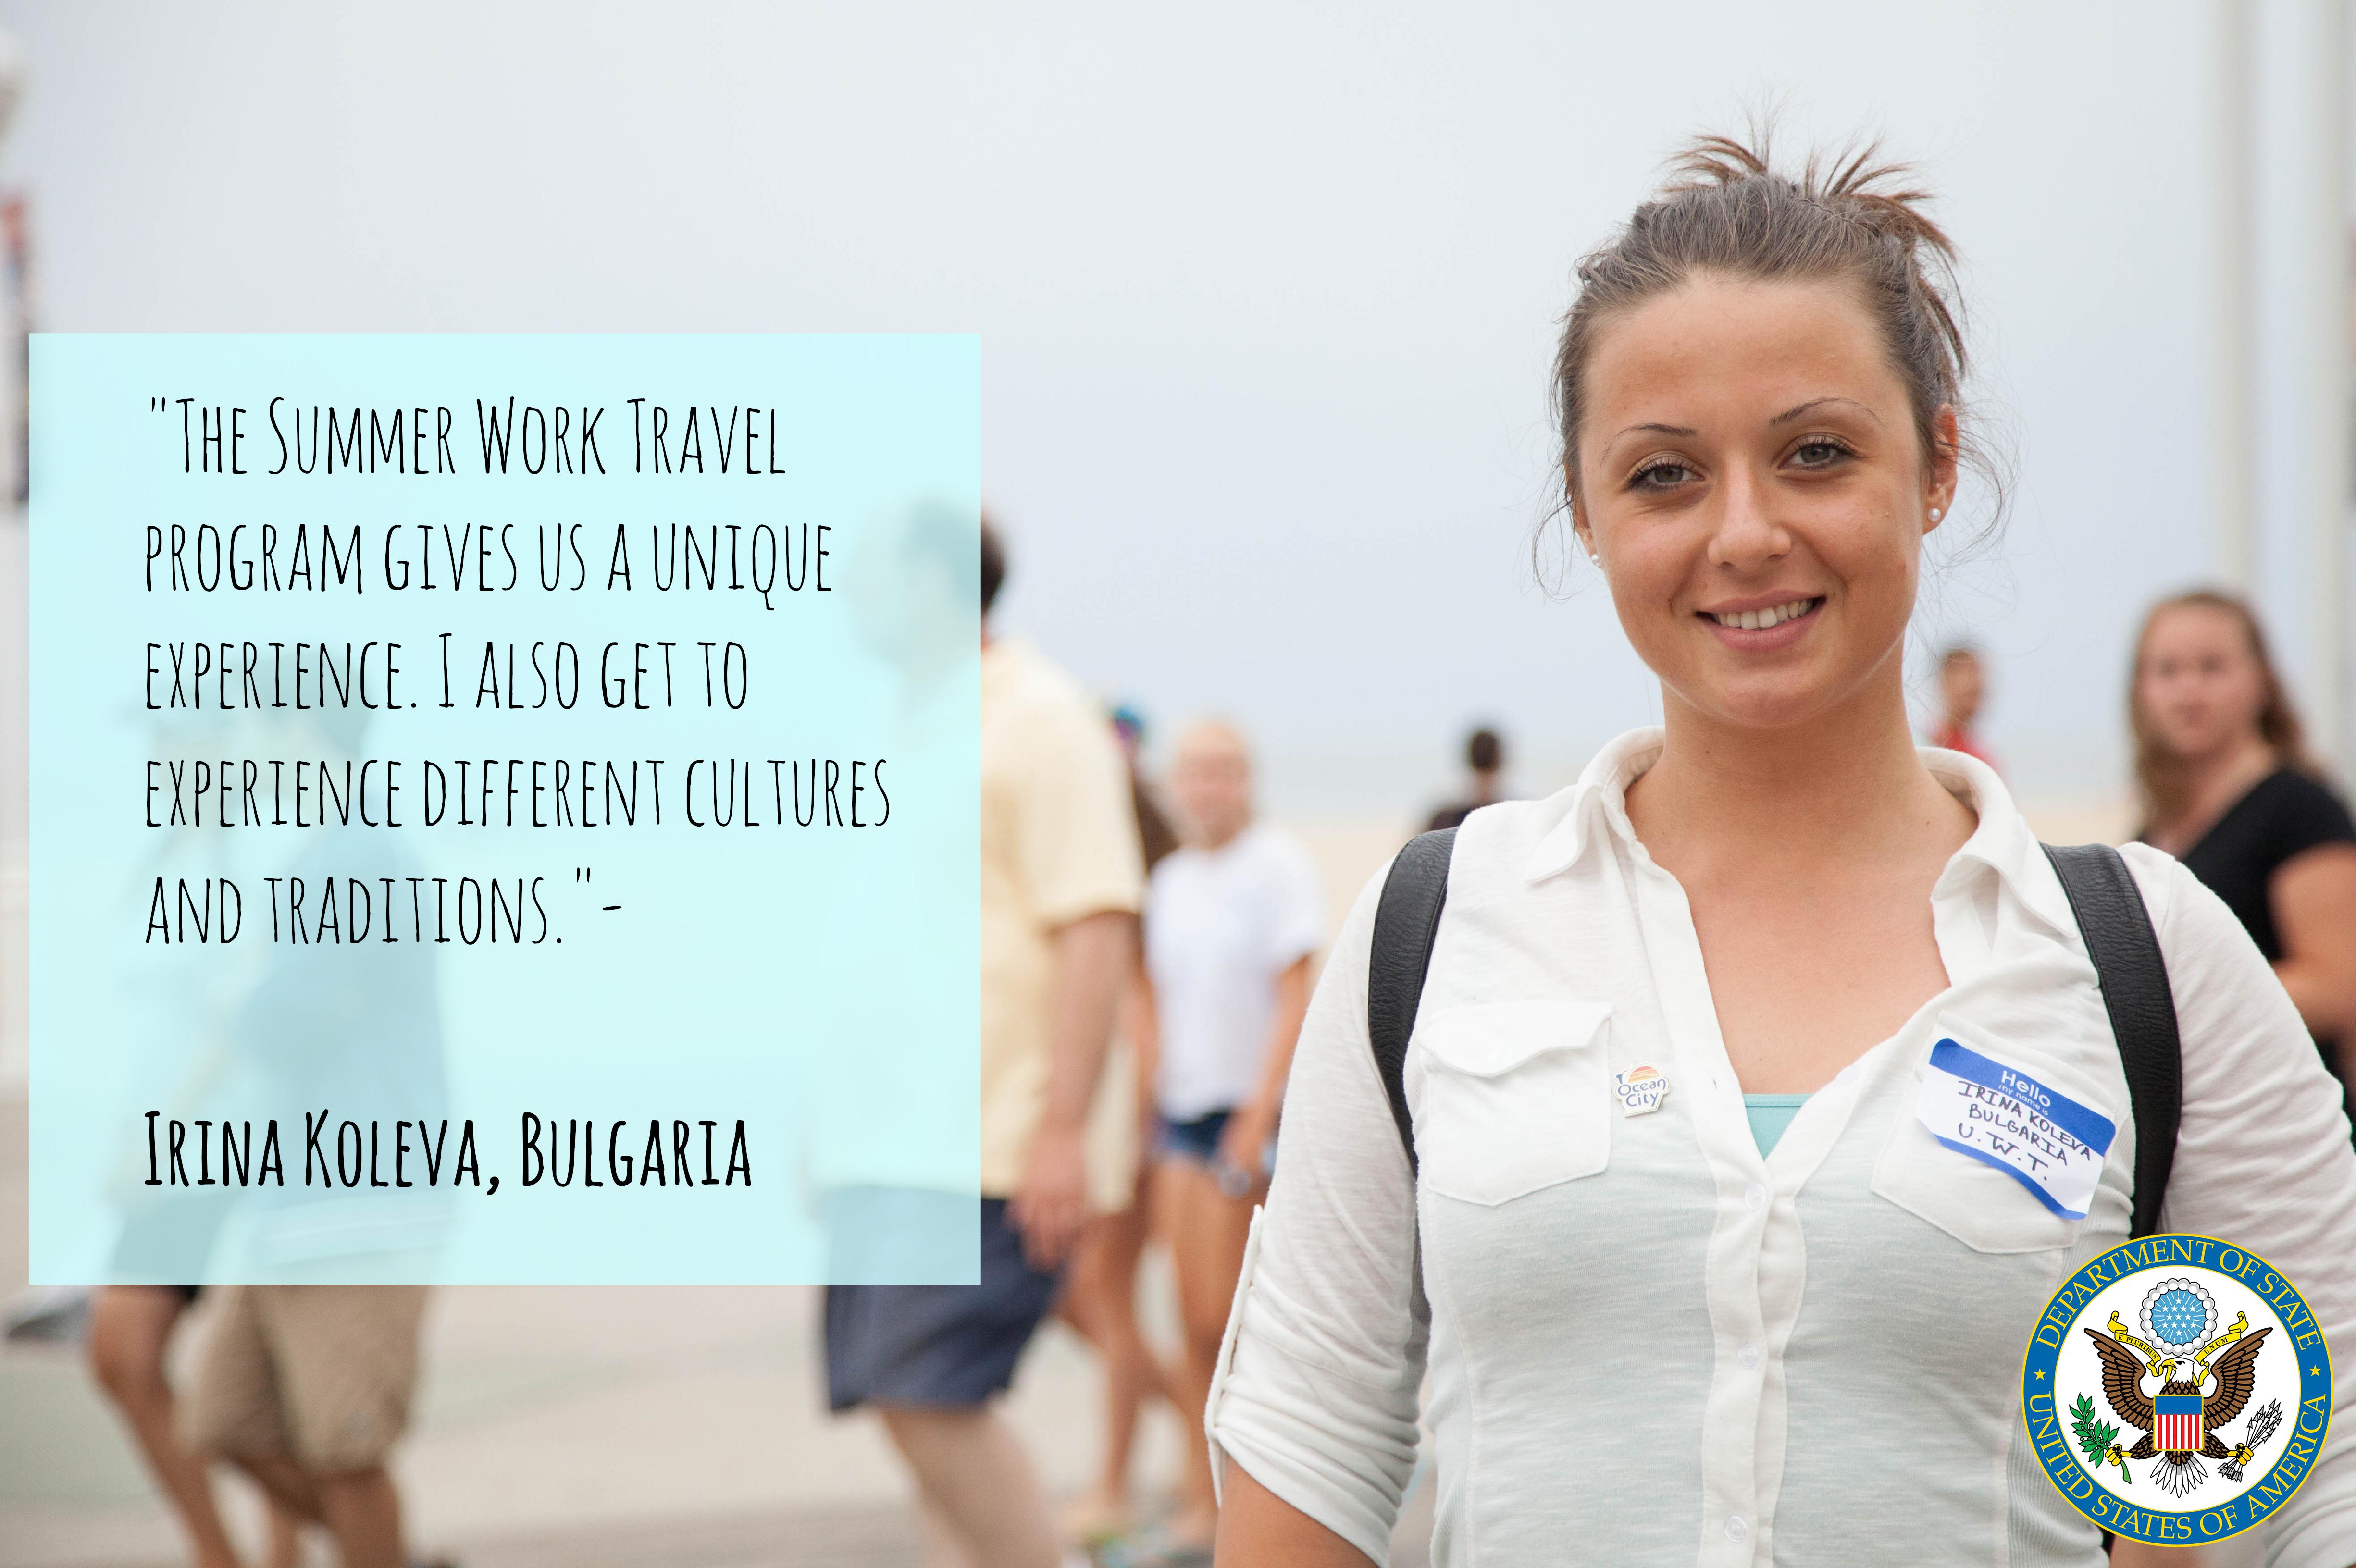 Irina Koleva, Bulgaria, People, RouteJ-1, Summer, Travel, HQ Photo